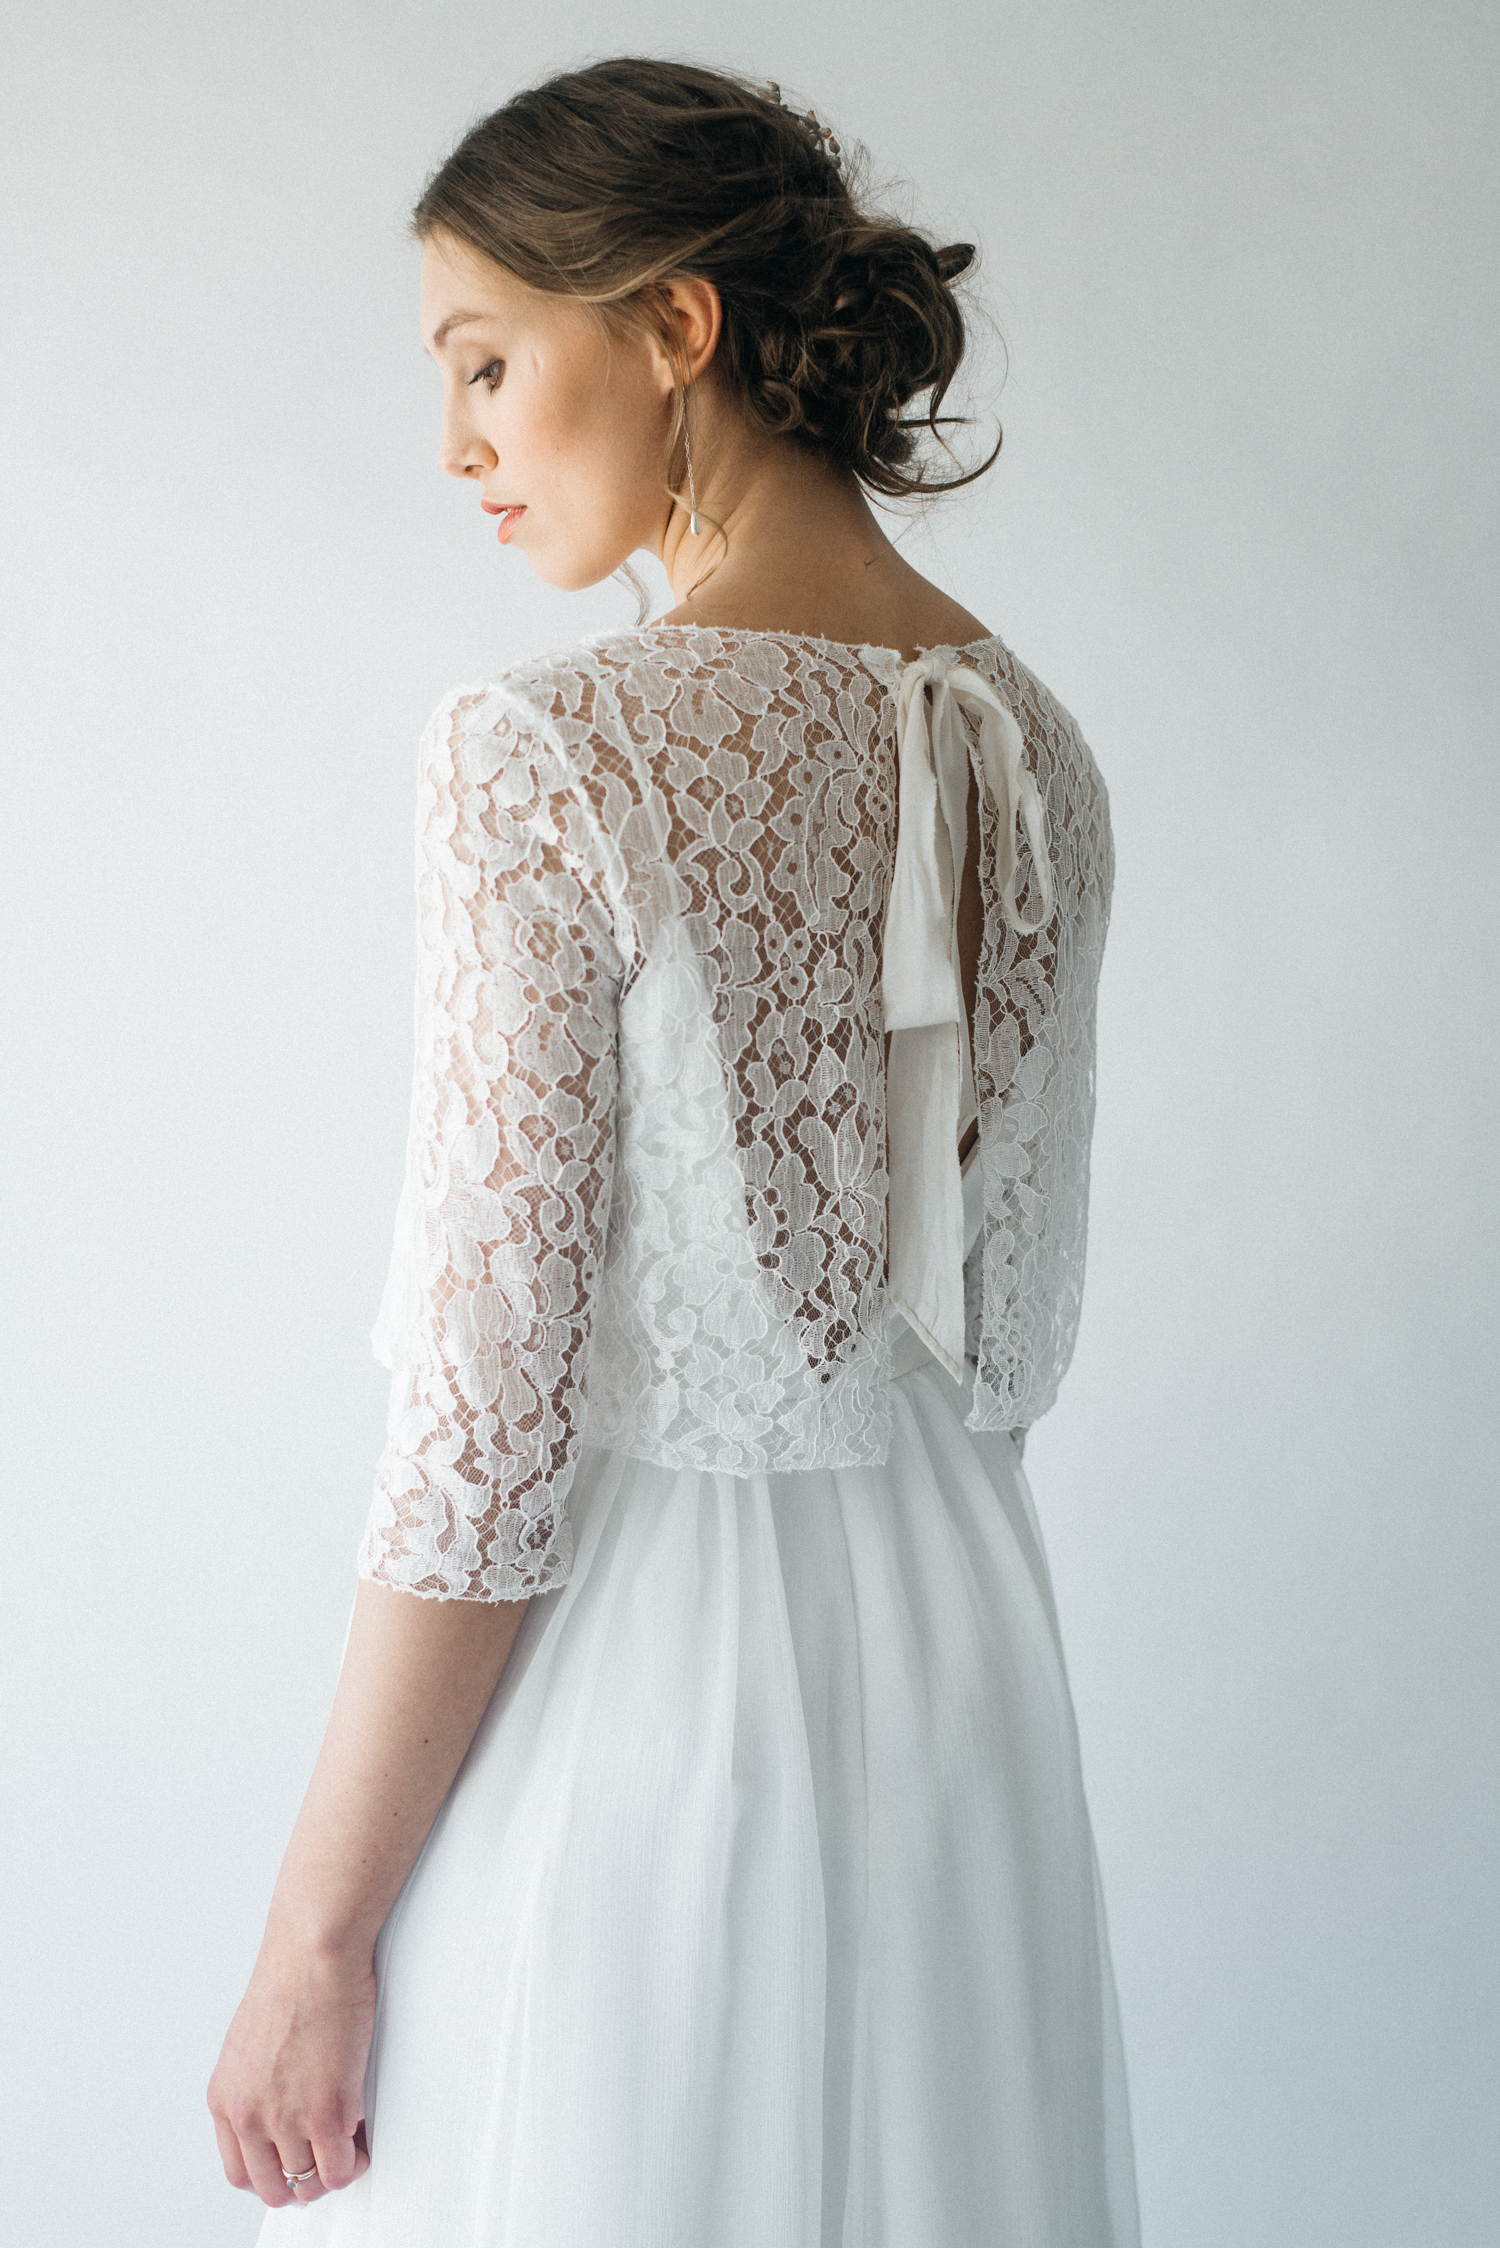 Handmade Lace Bridal Top